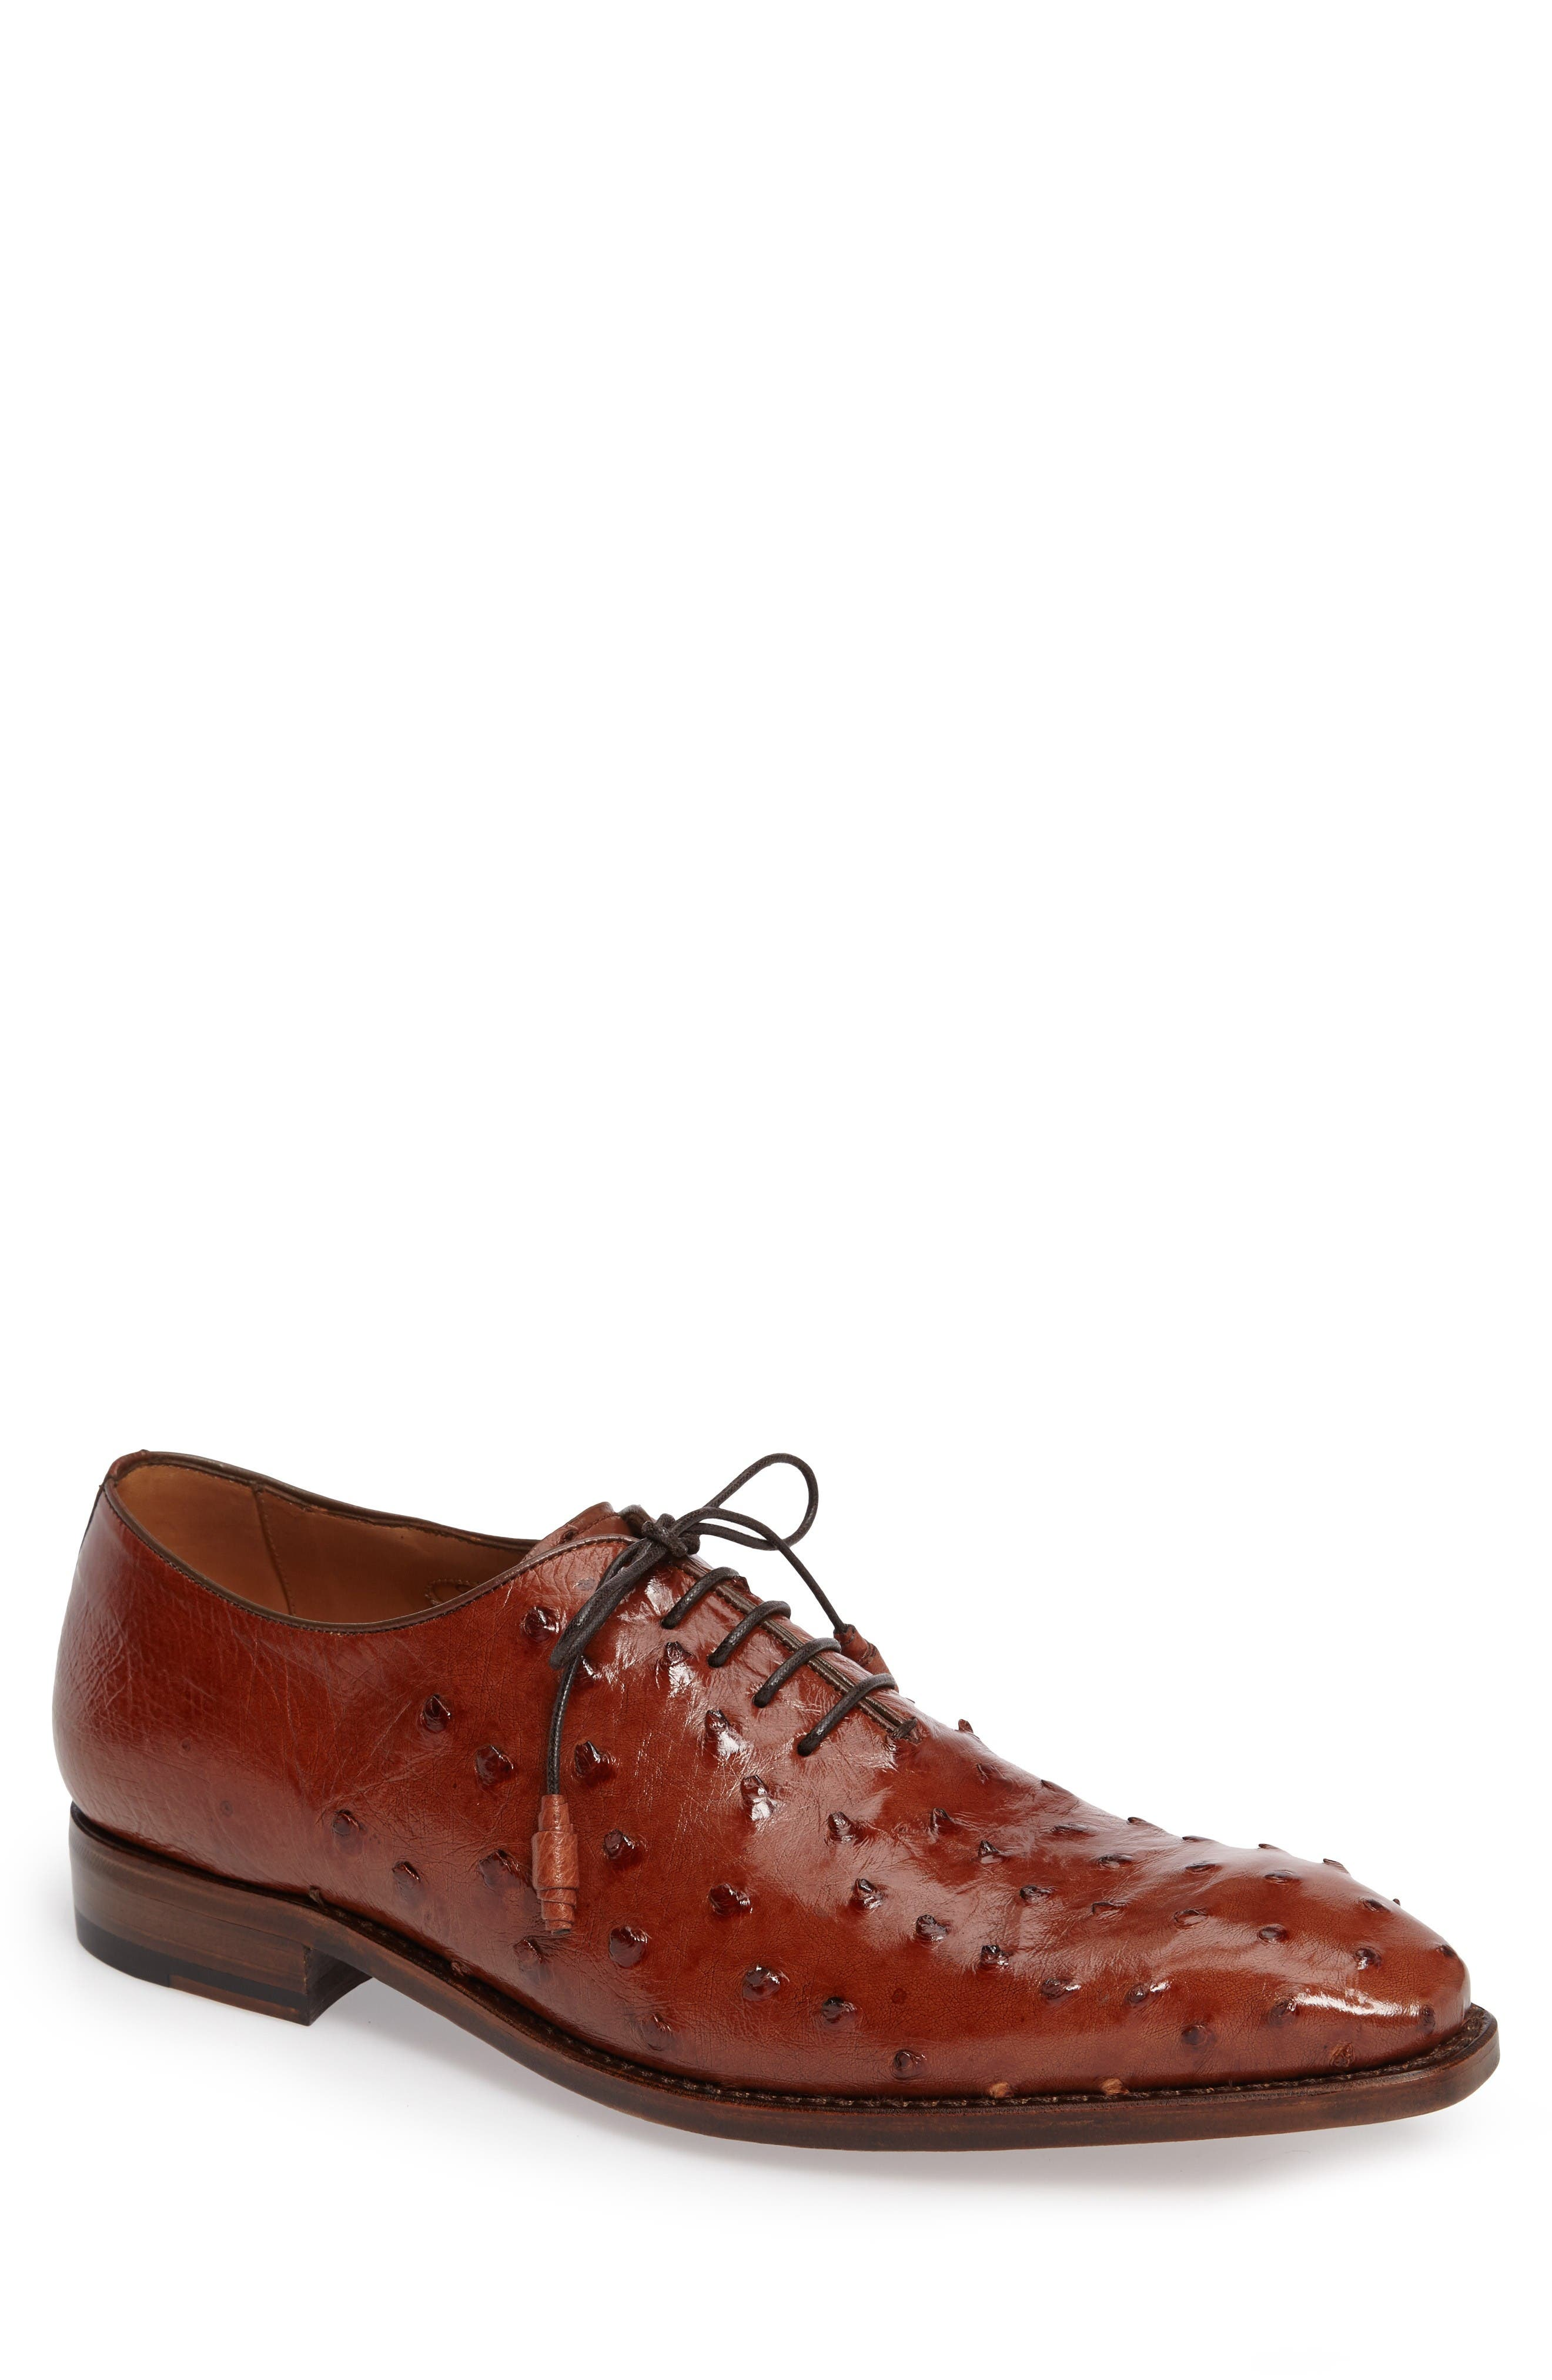 Impronta by Mezlan G504-S Plain Toe Oxford (Men)